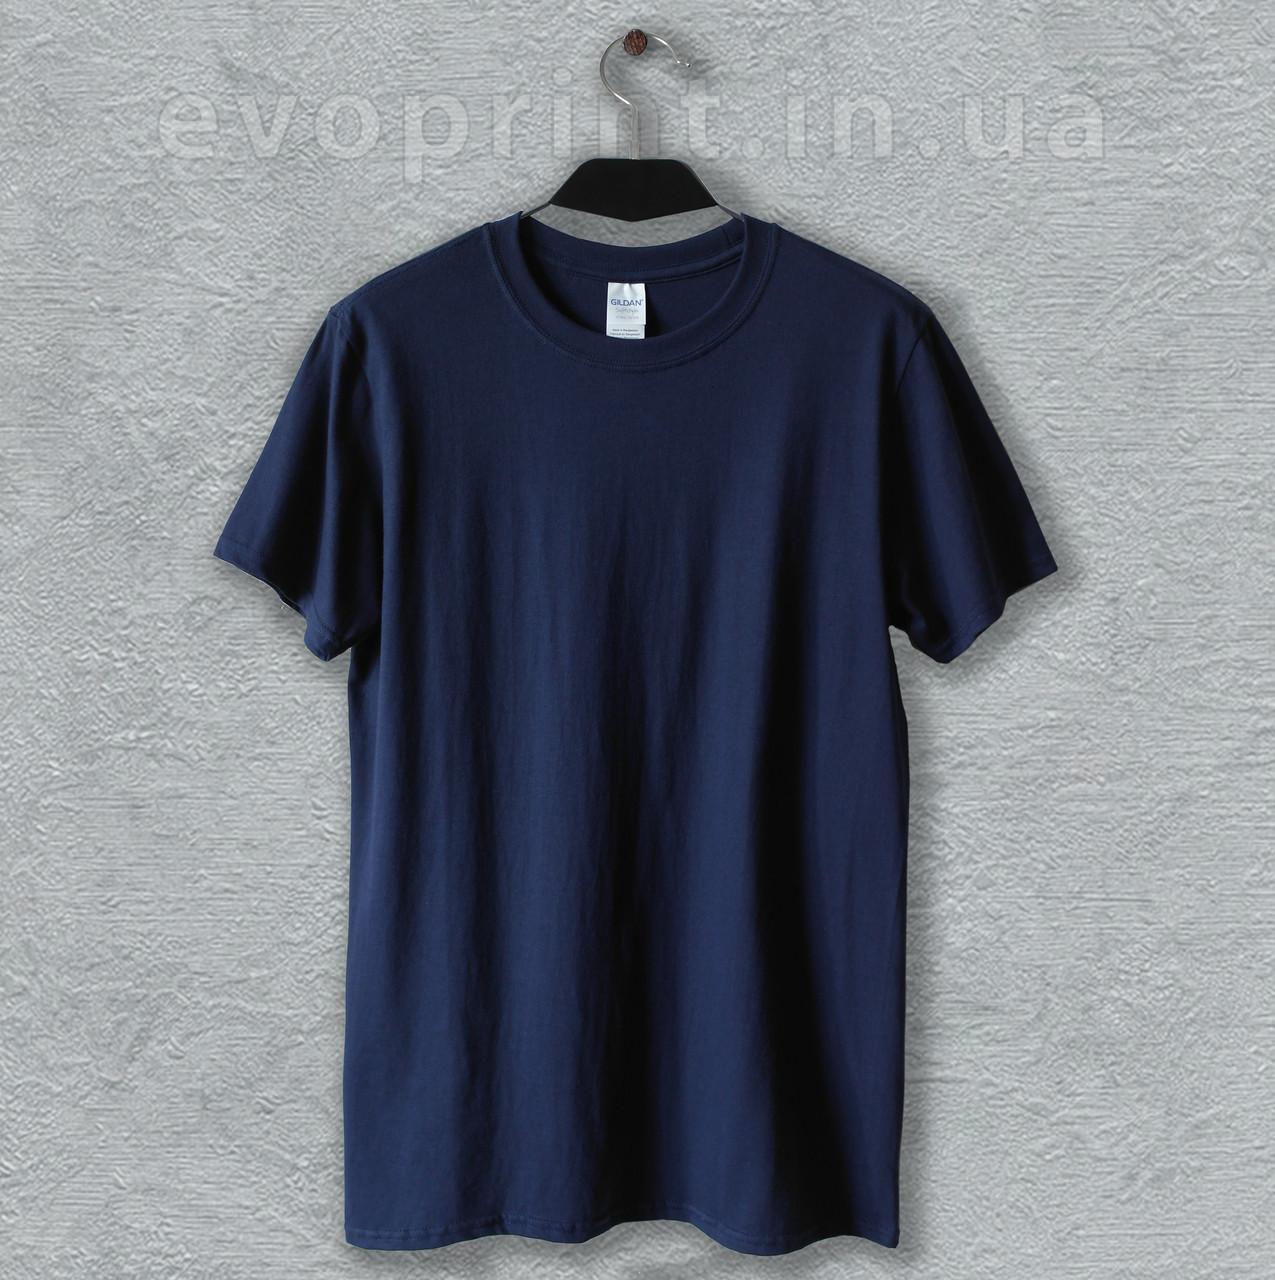 Однотонная футболка мужская темно-синяя